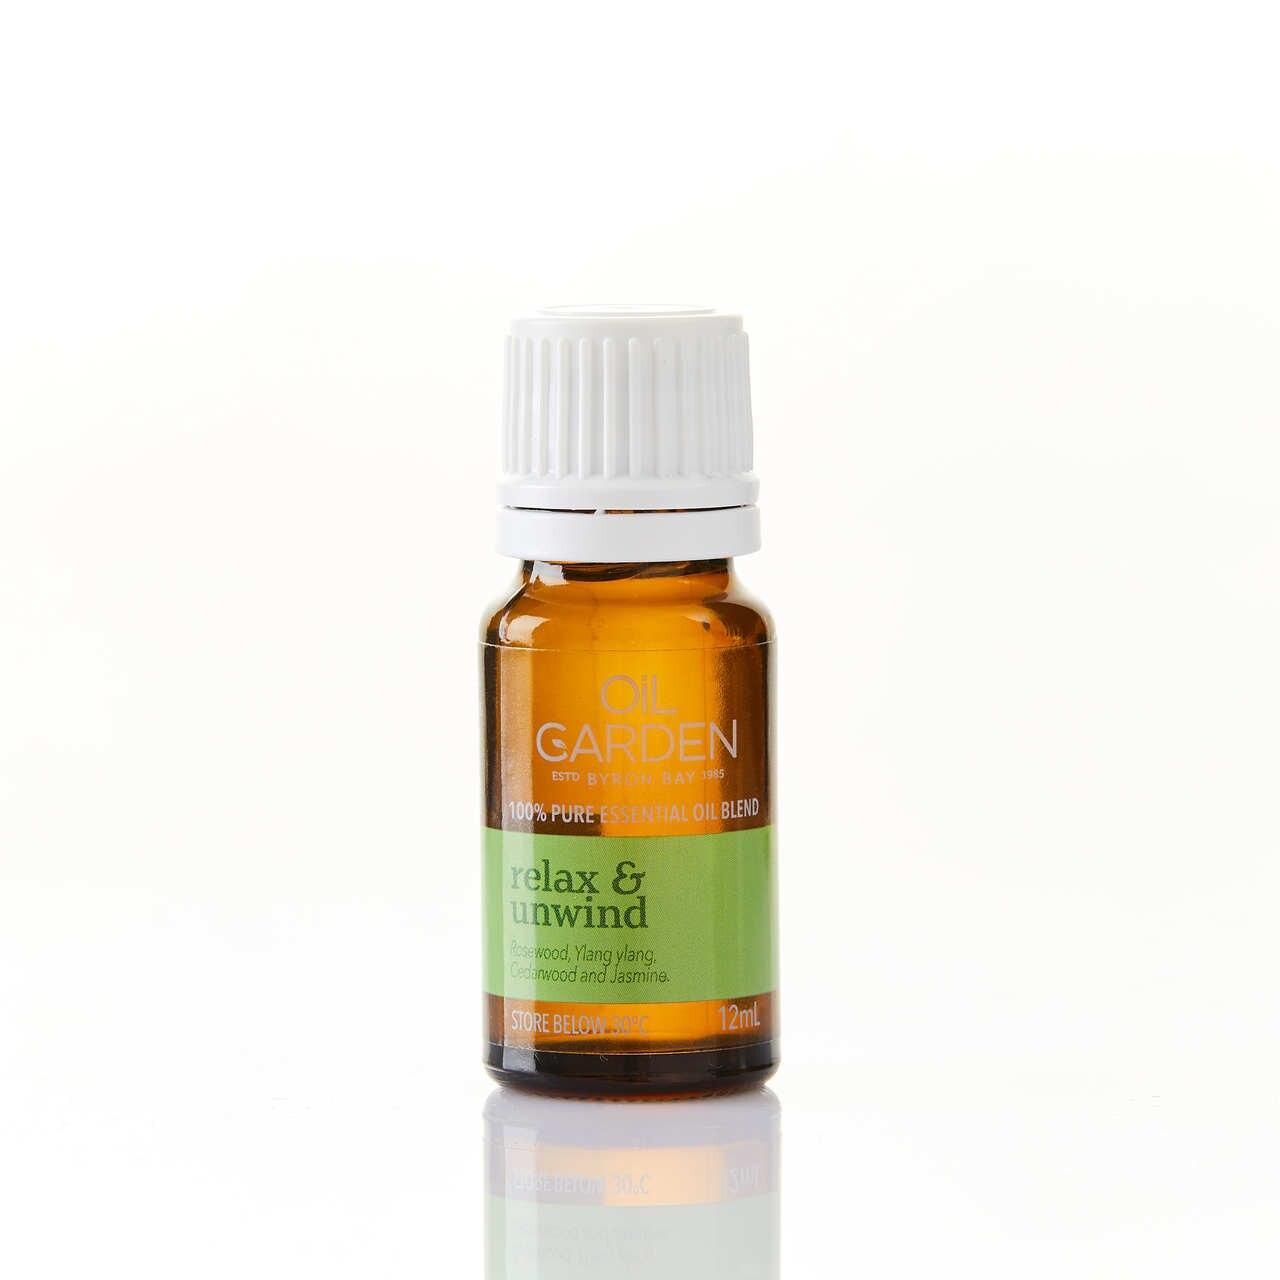 Oil Garden Relax & Unwind Essential Oil Blend 12mL 6620002